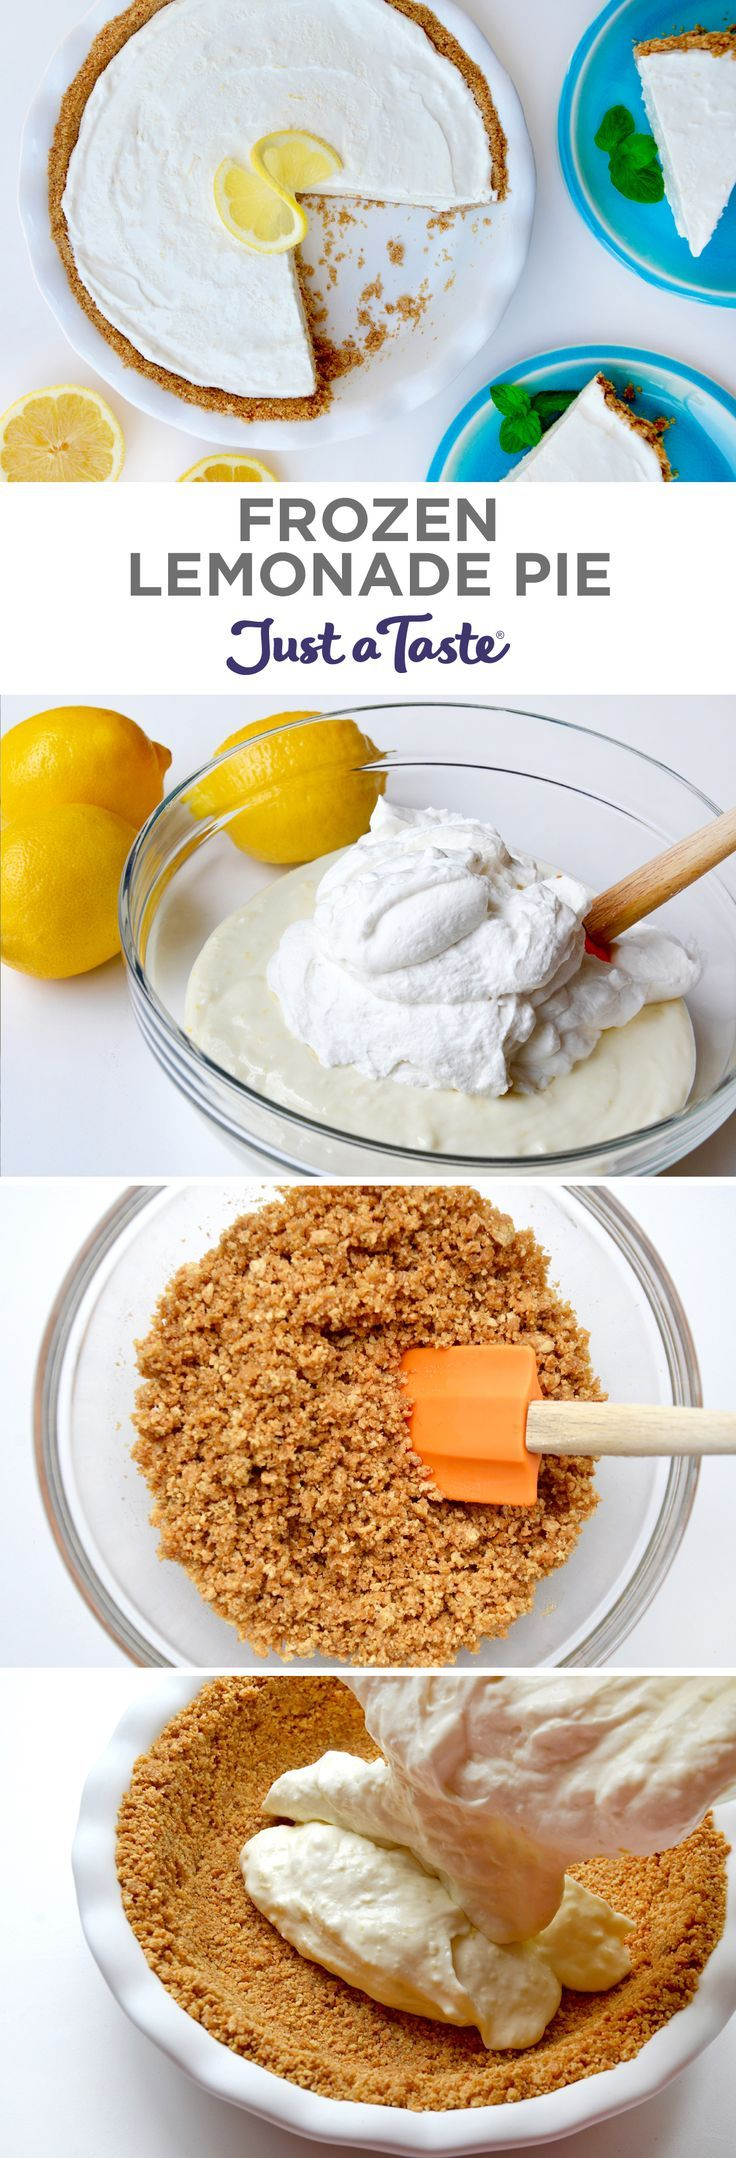 Frozen Lemonade Pie | recipe via http://justataste.com